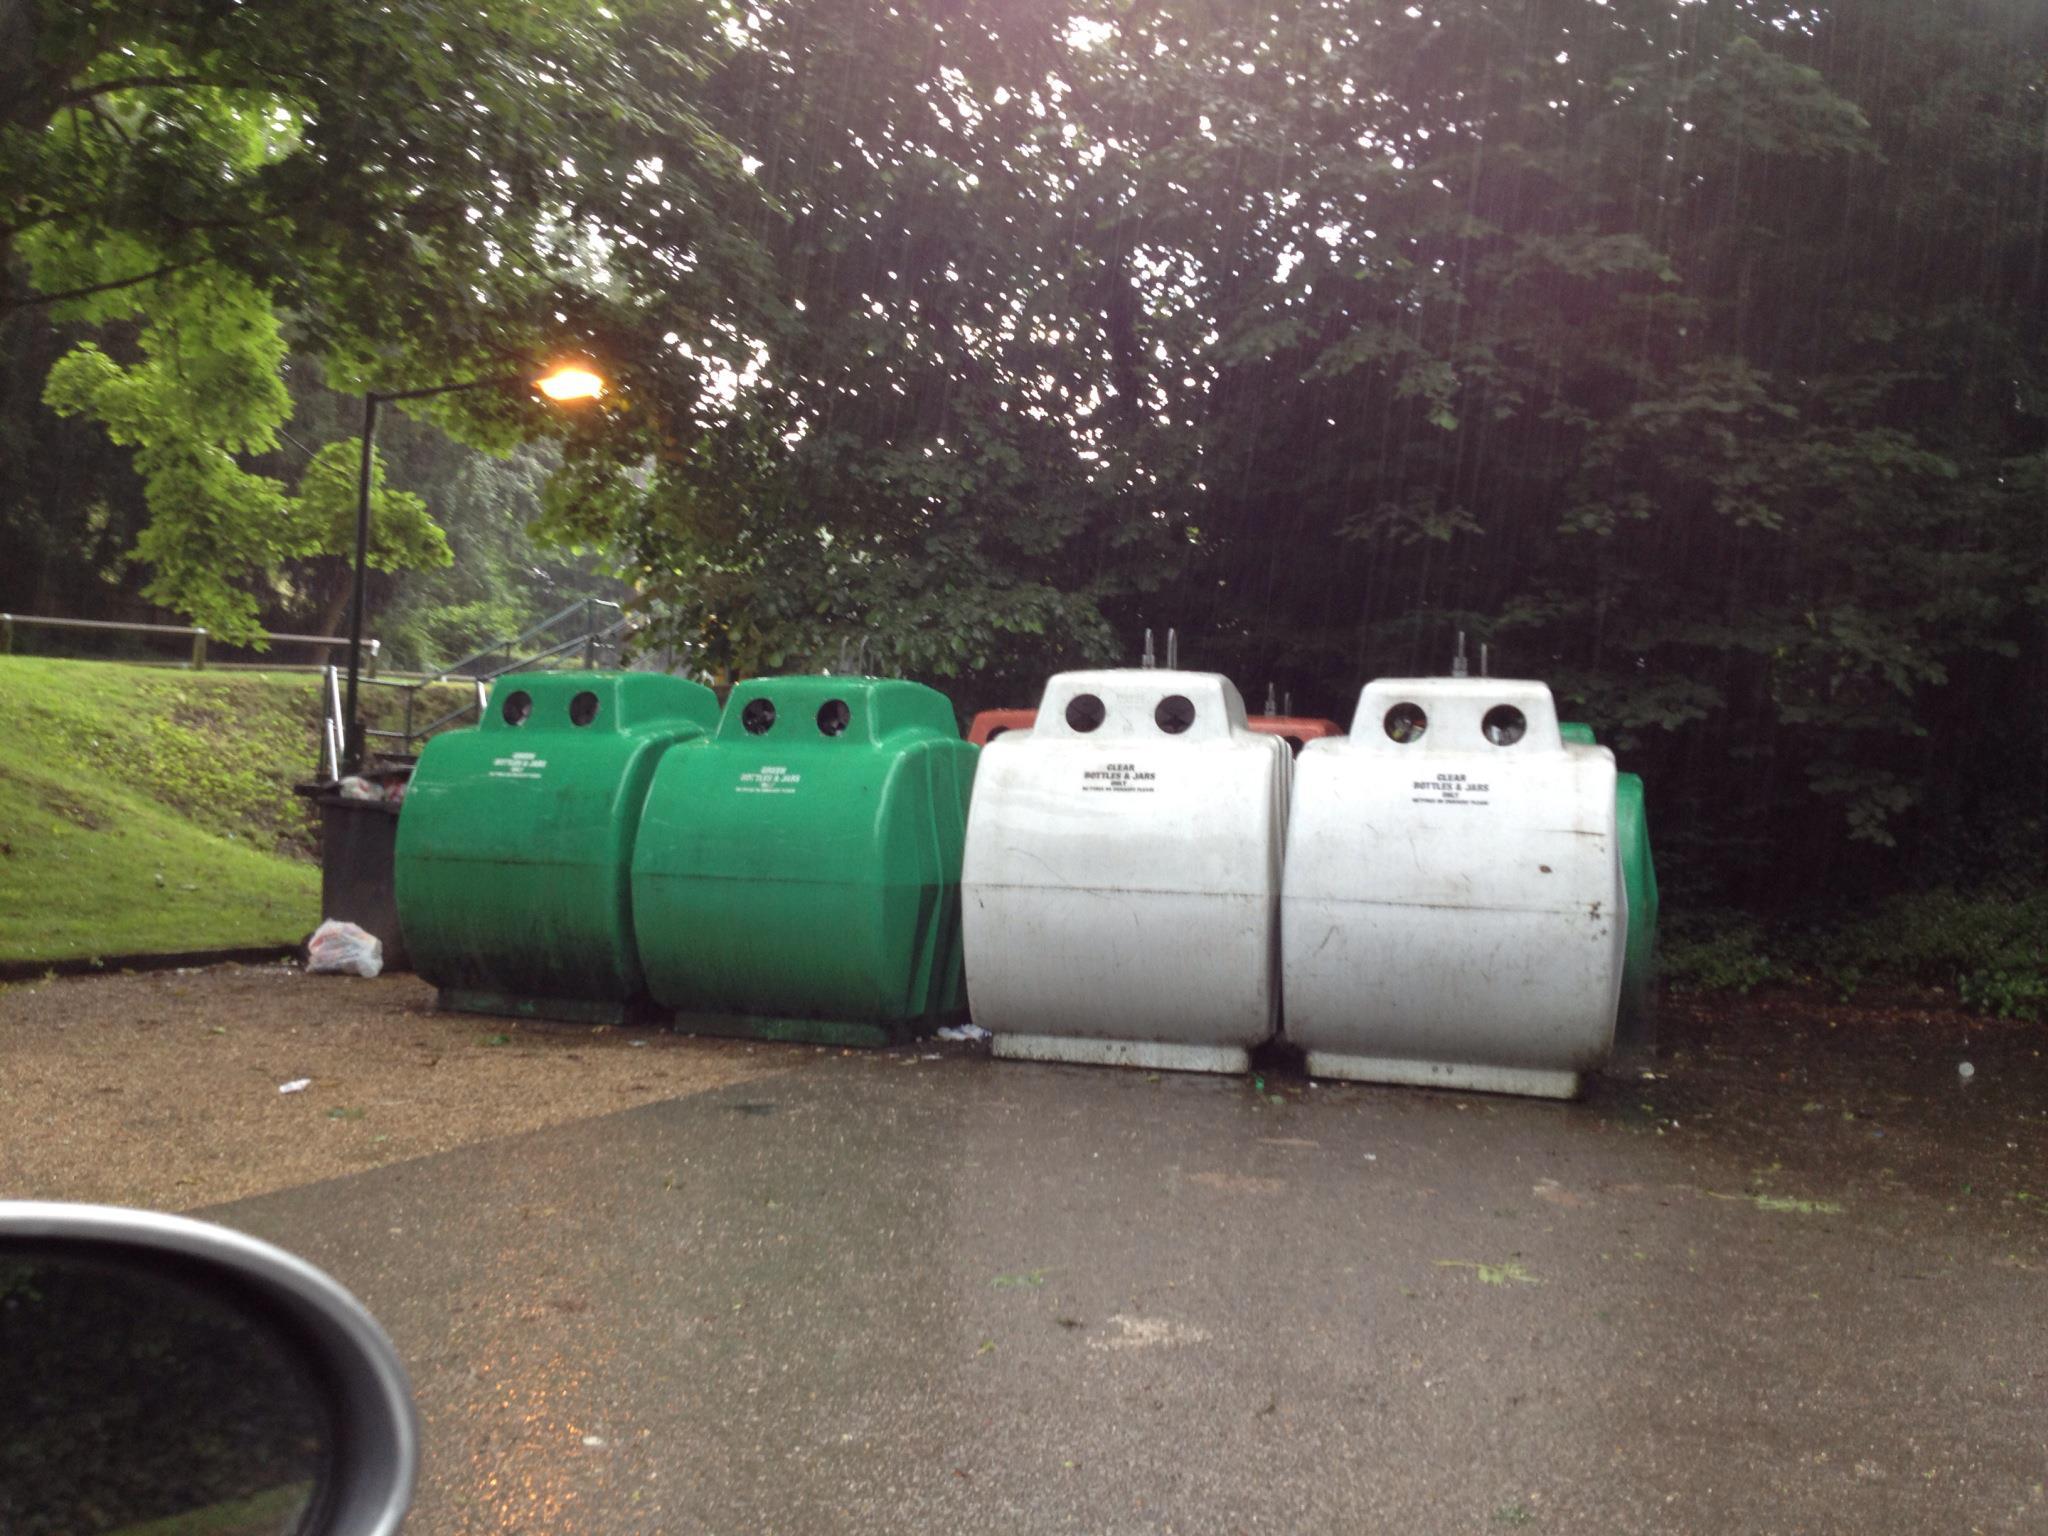 Ightham village recycling bins